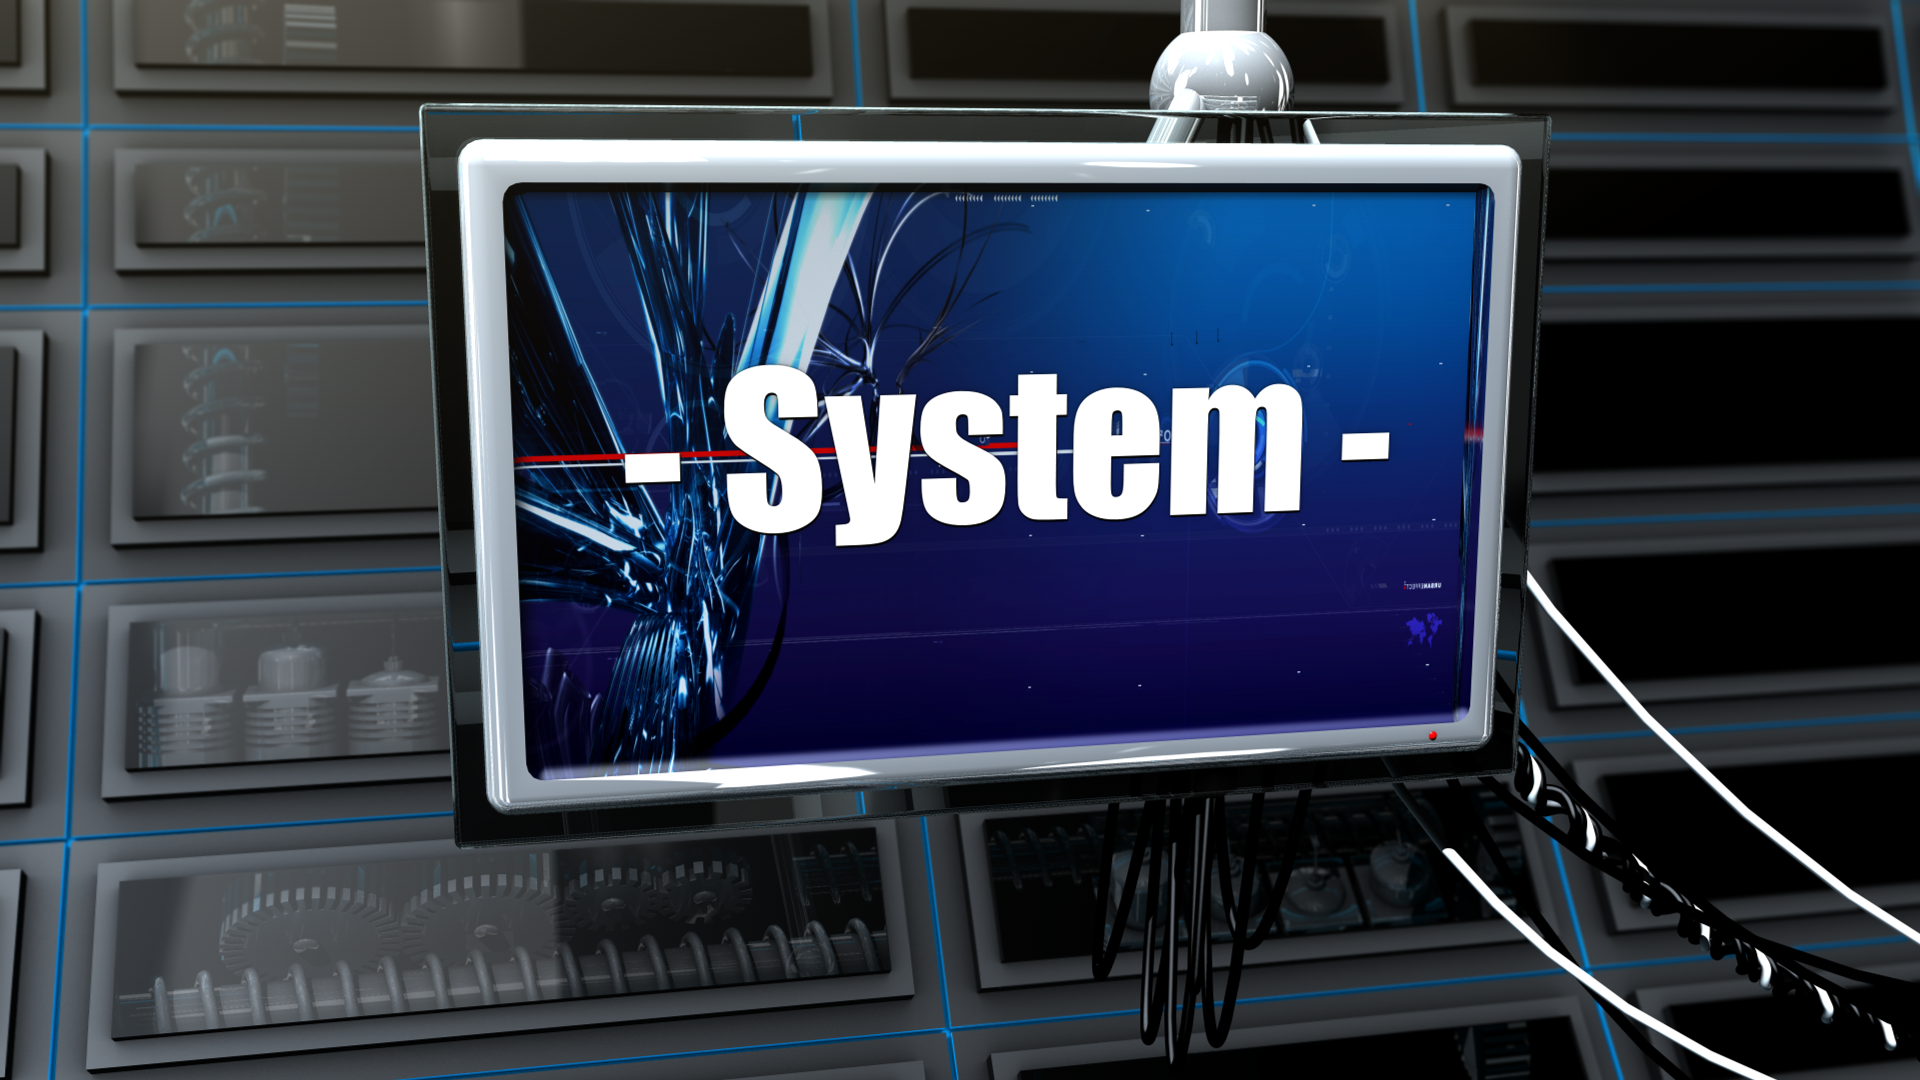 xbmc system 1080p by rayspoint on deviantart